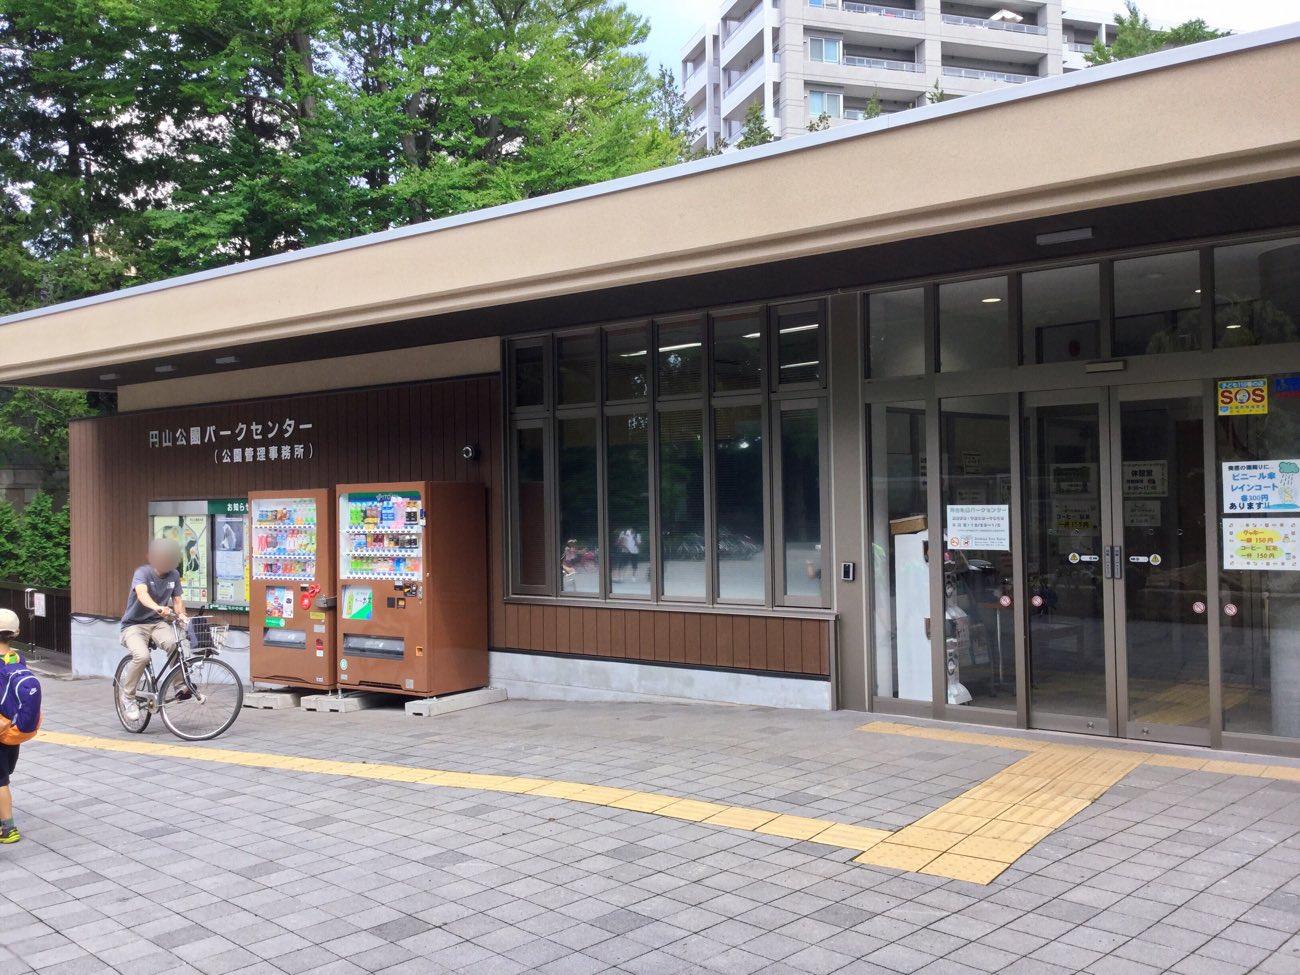 丸山公園の管理事務所